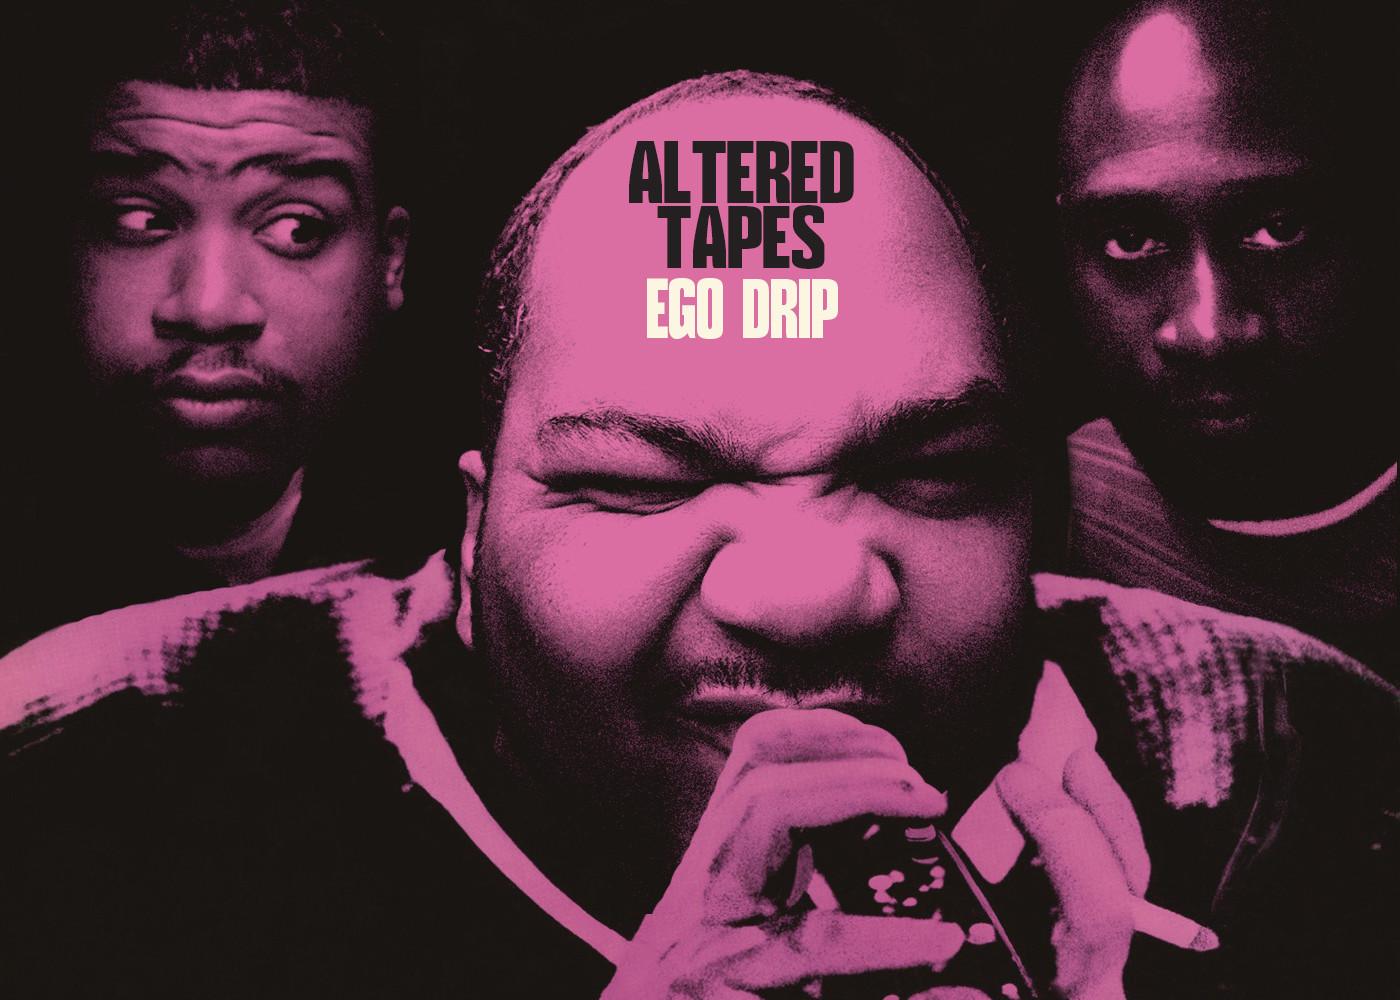 ego-drip-cover-art-2.jpg